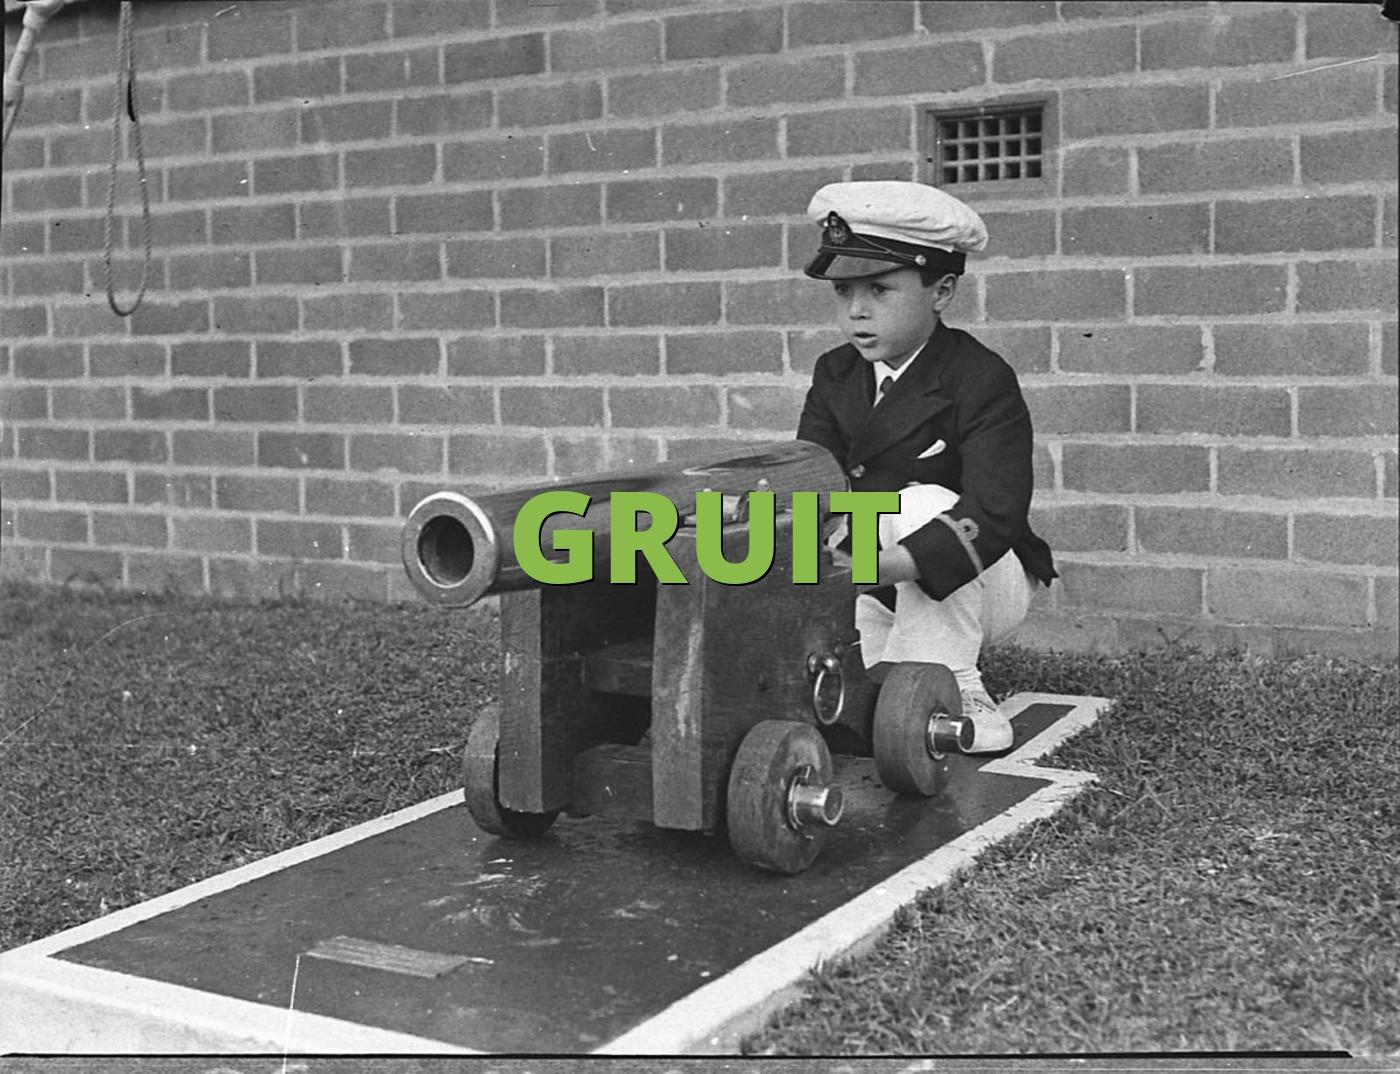 GRUIT